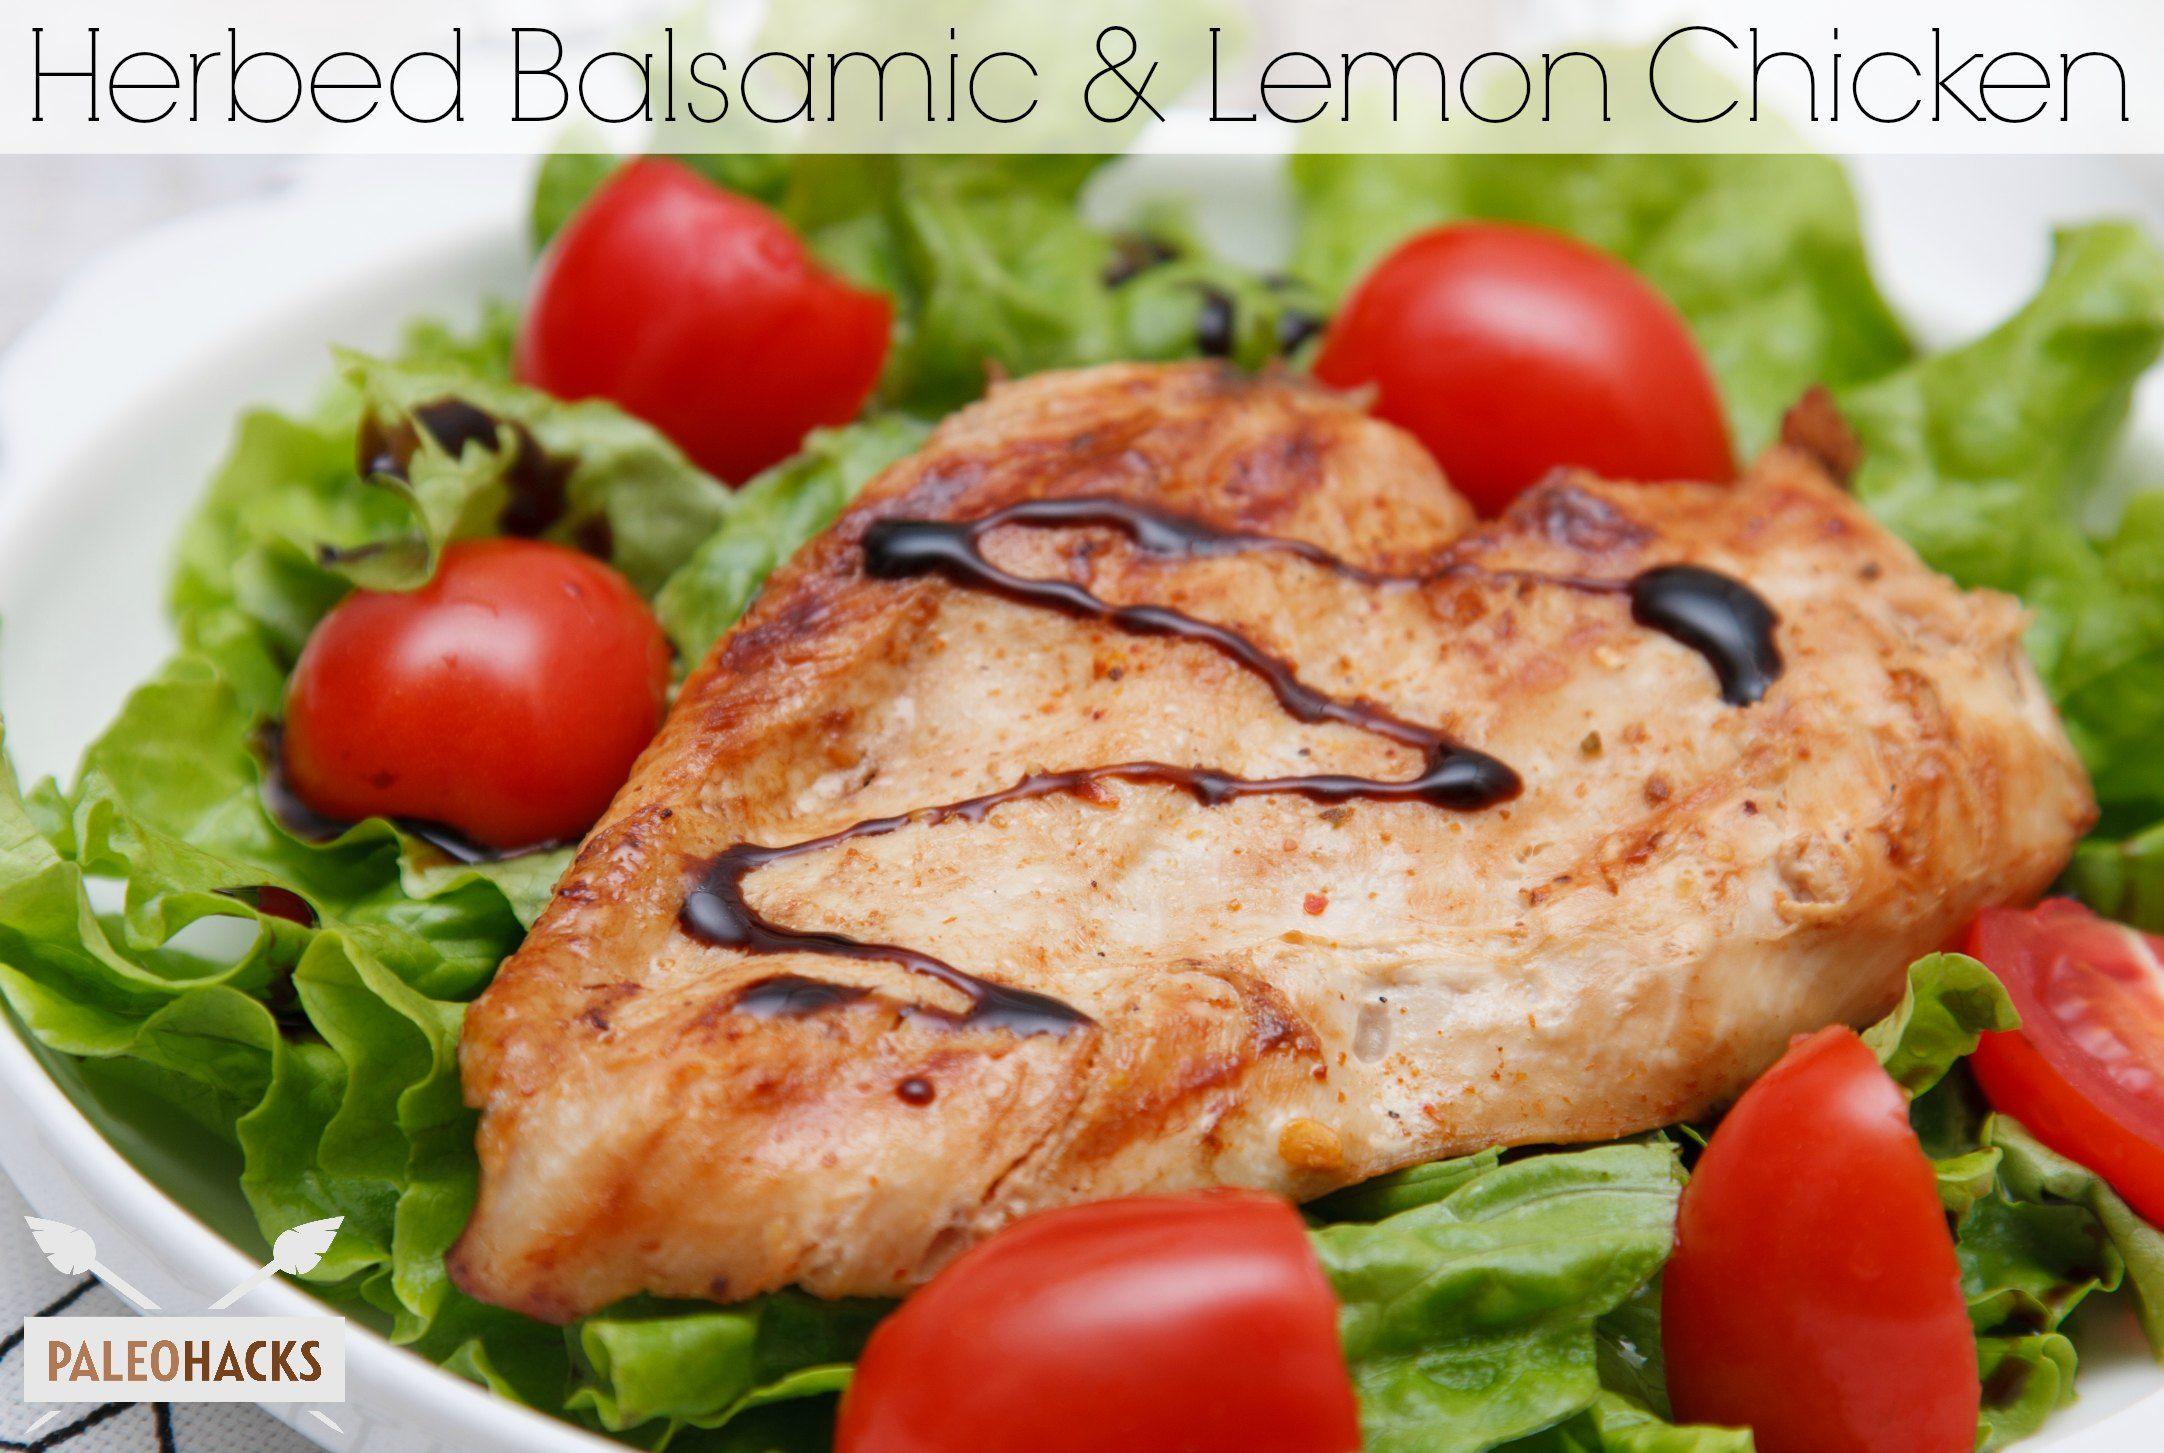 Herbed Balsamic and Lemon Chicken